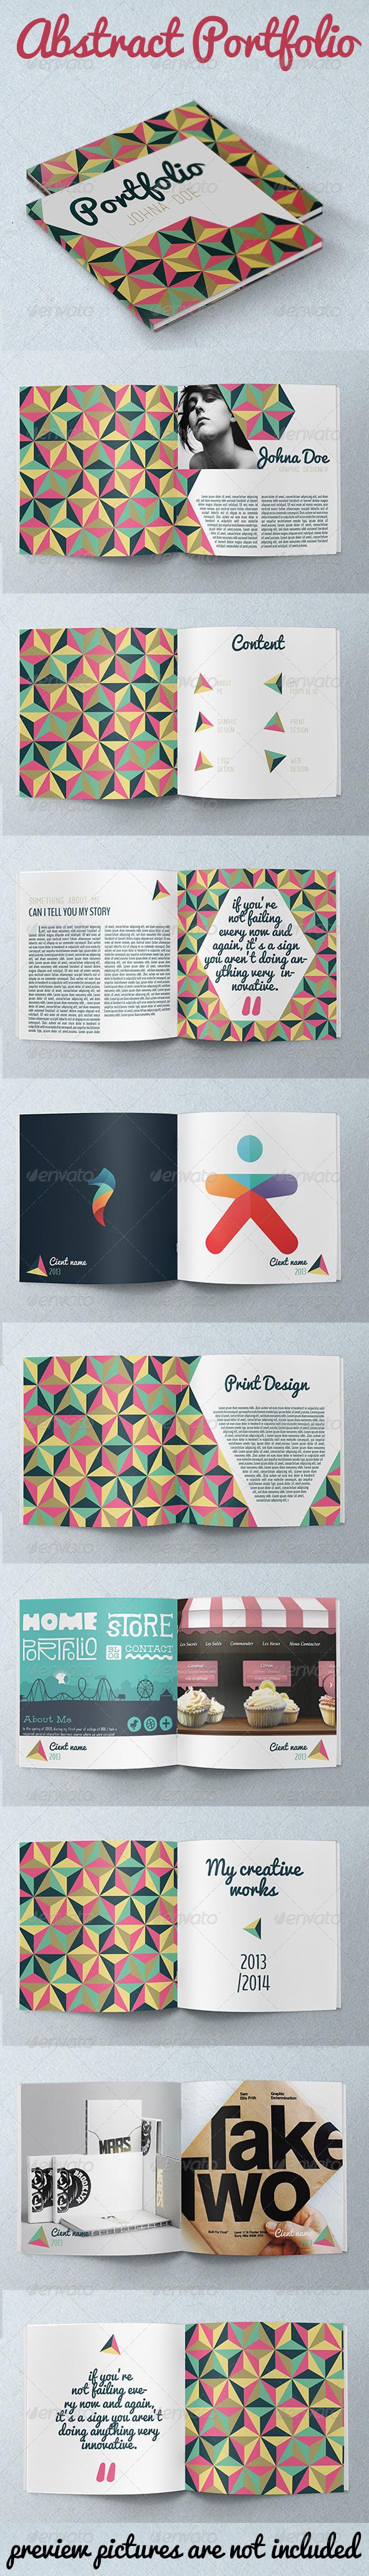 GraphicRiver Abstract Portfolio Brochure 5474058